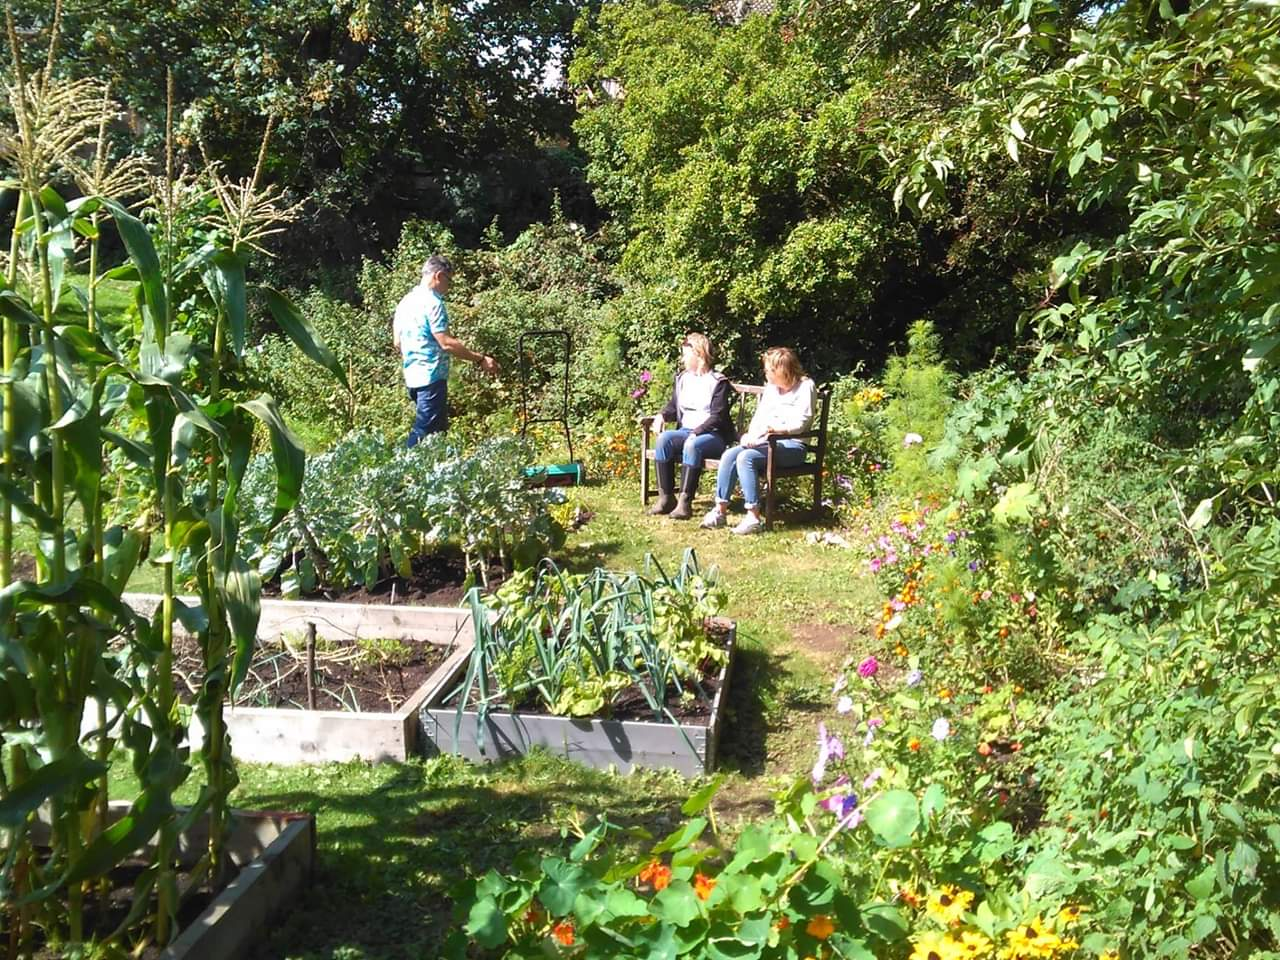 Peacehaven Community Garden